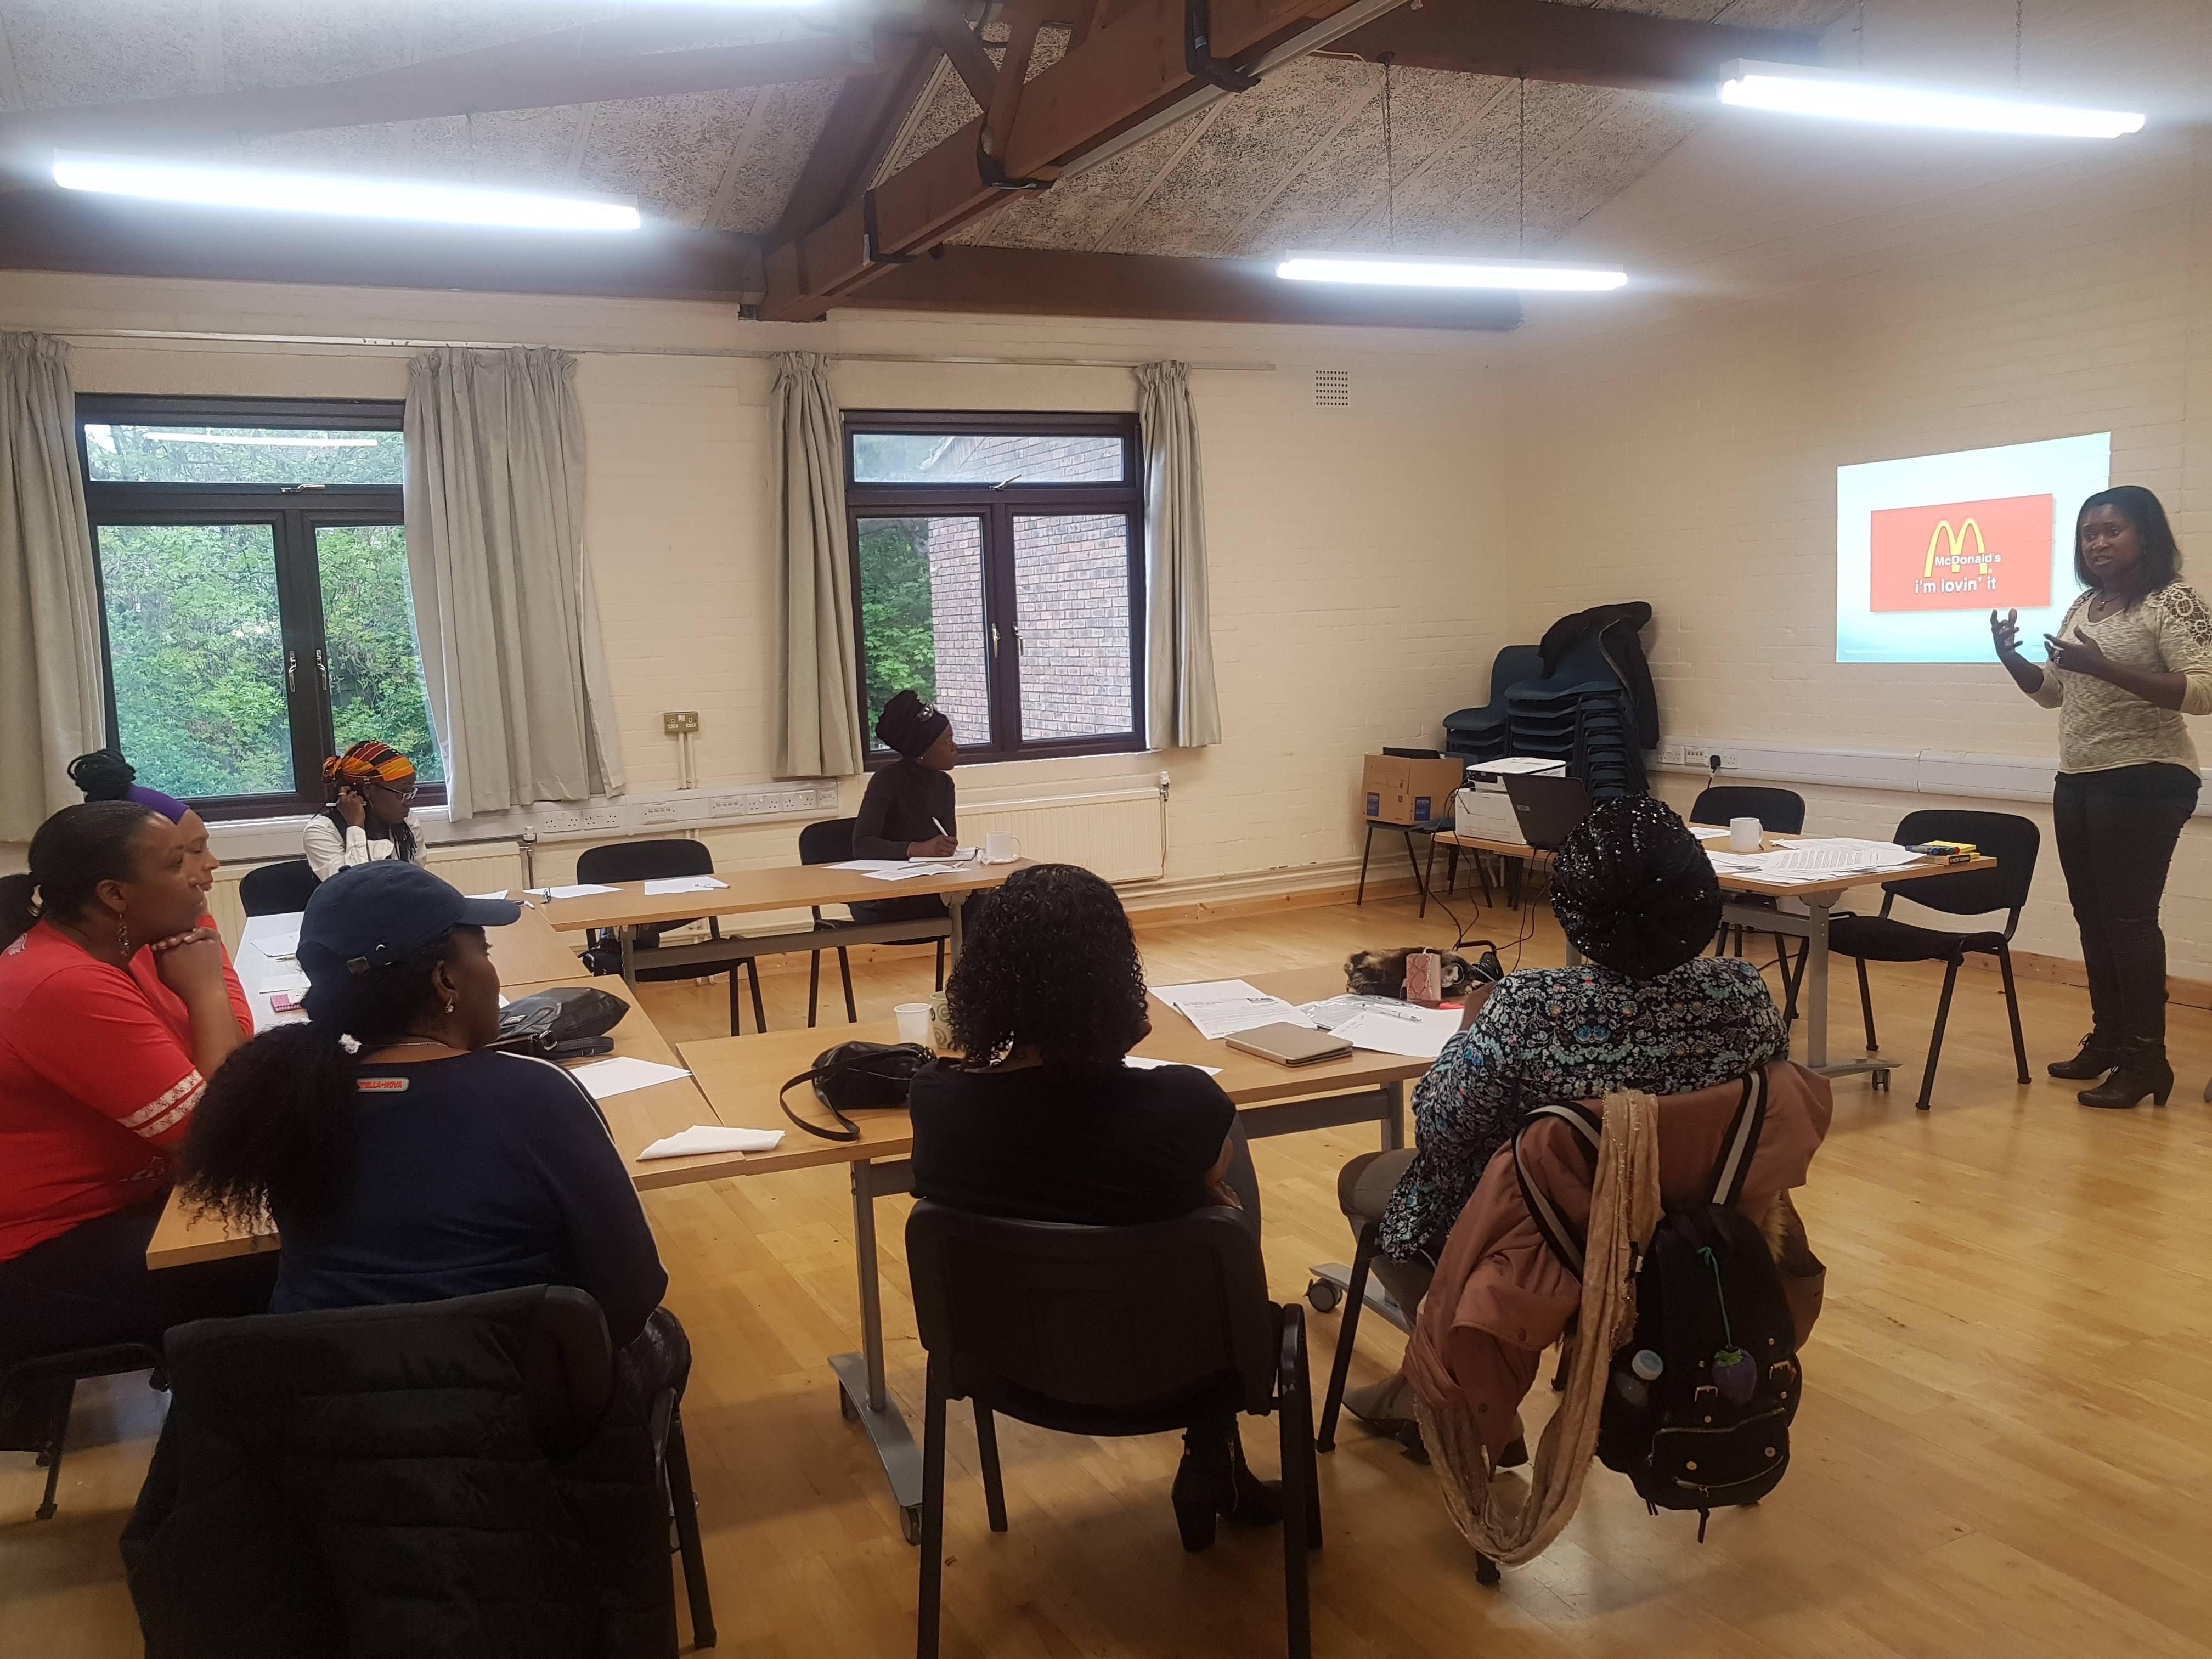 Our facilitator Kunbi